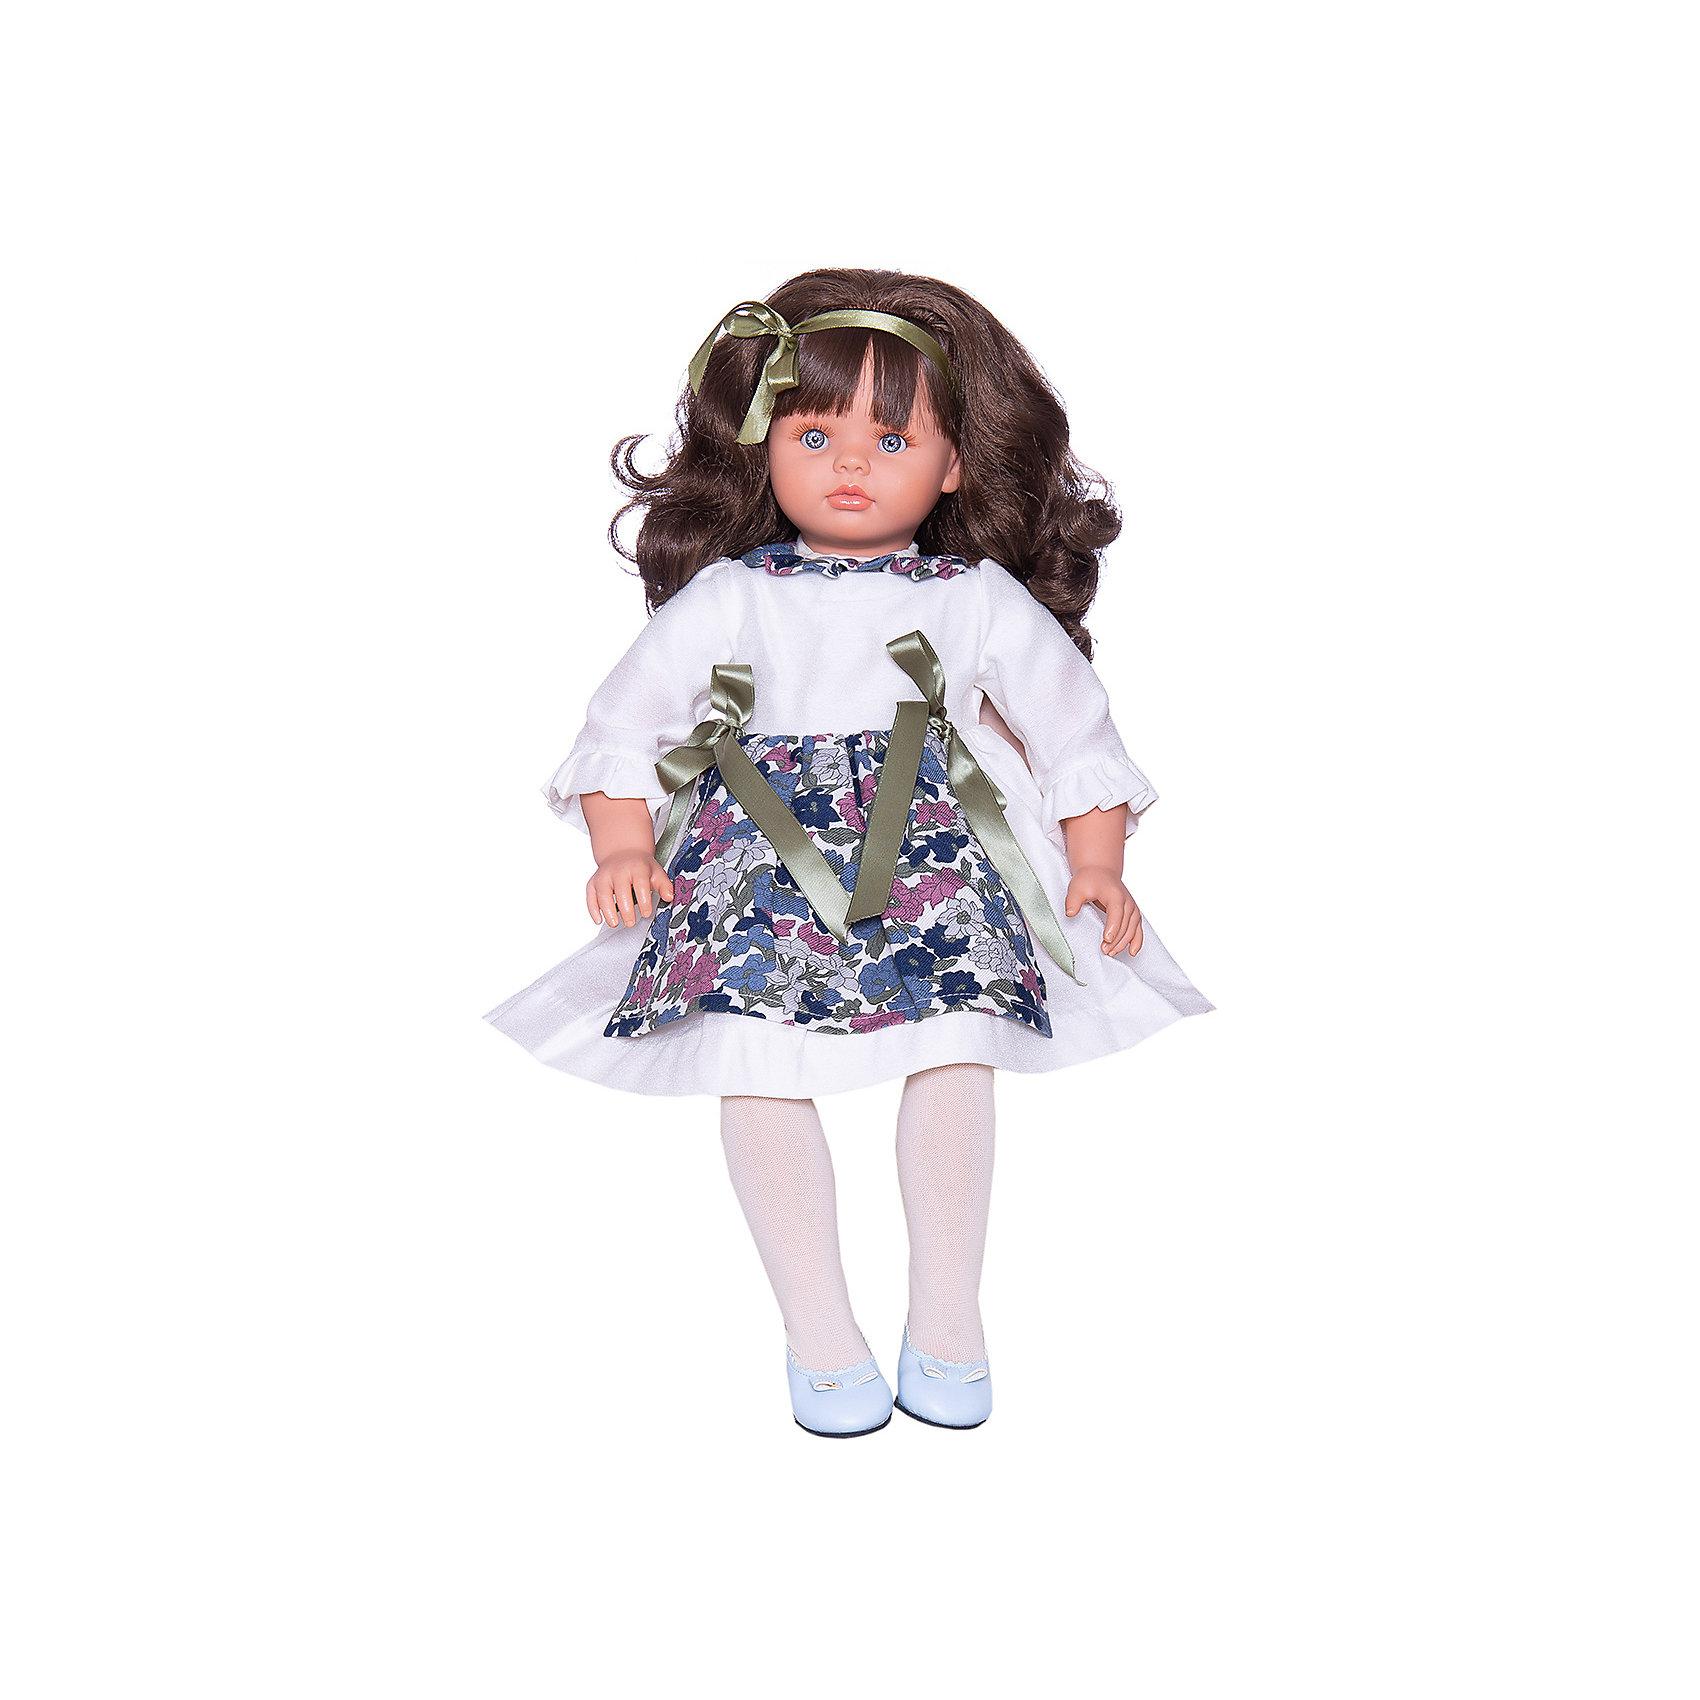 Кукла Asi Пепа 60 см, арт 282880 по цене 10 990